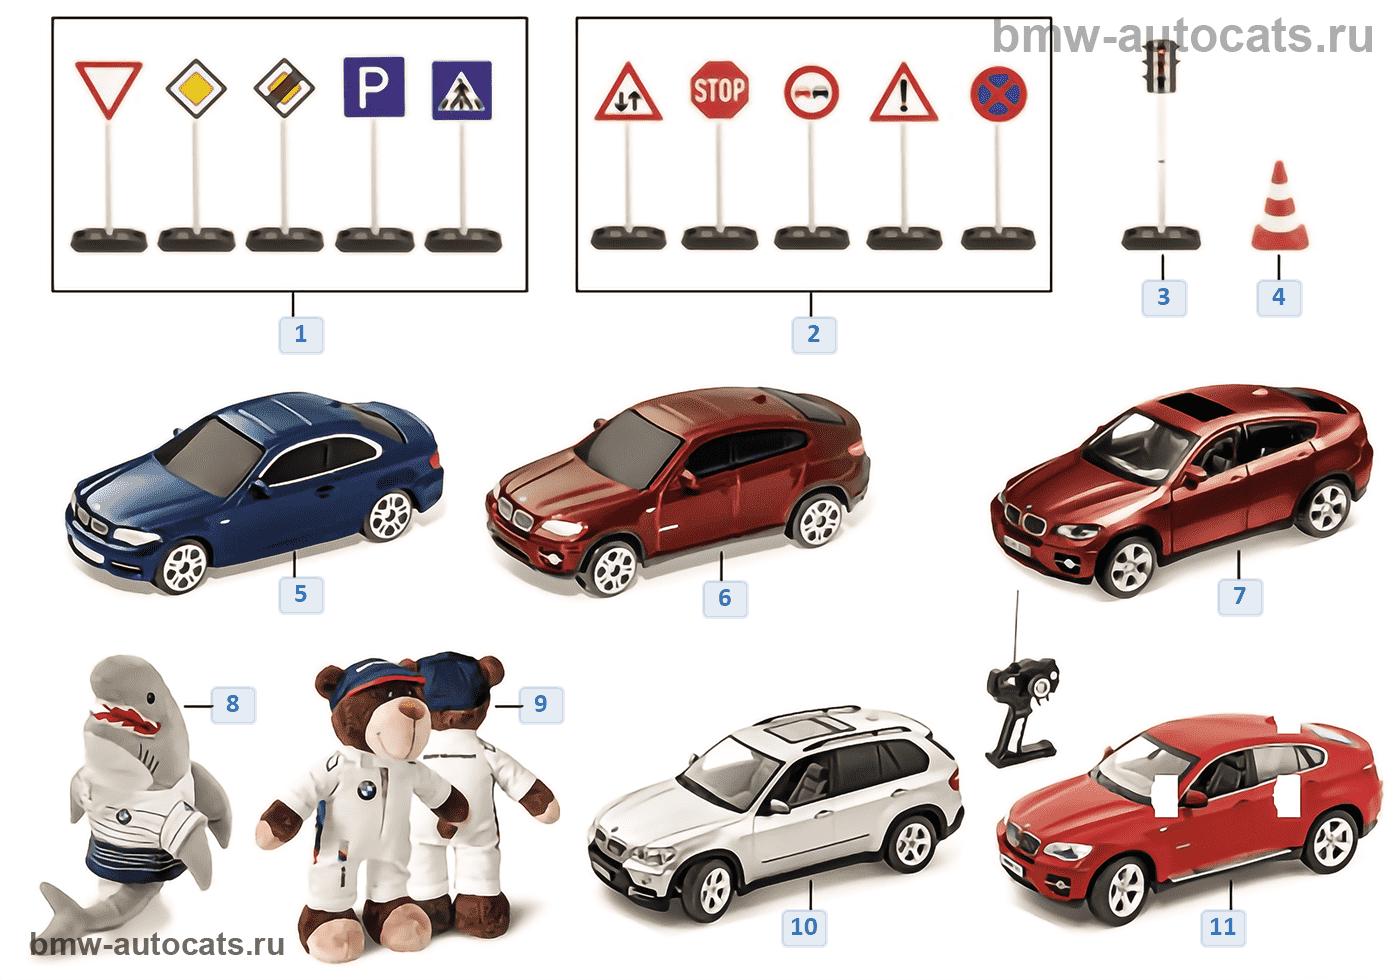 BMW Kinderprogramm — Spielzeuge 2011/12